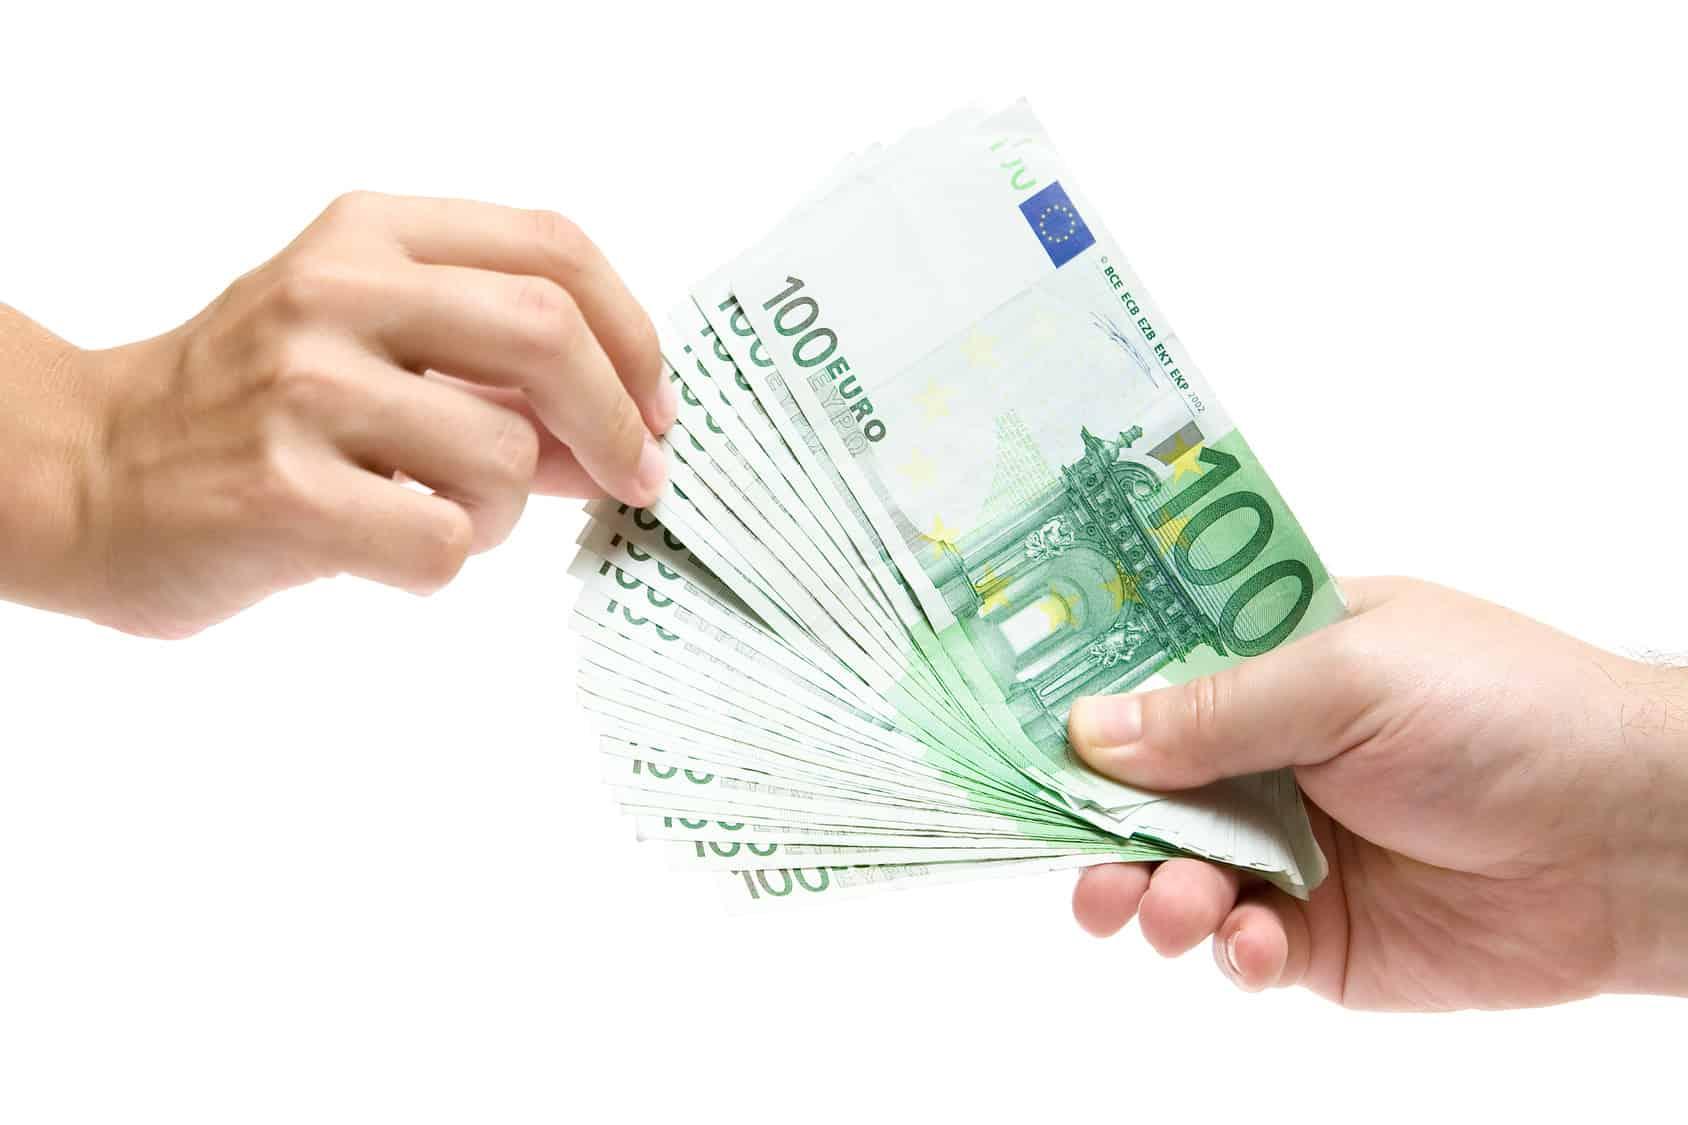 credito para reformas 600 euros